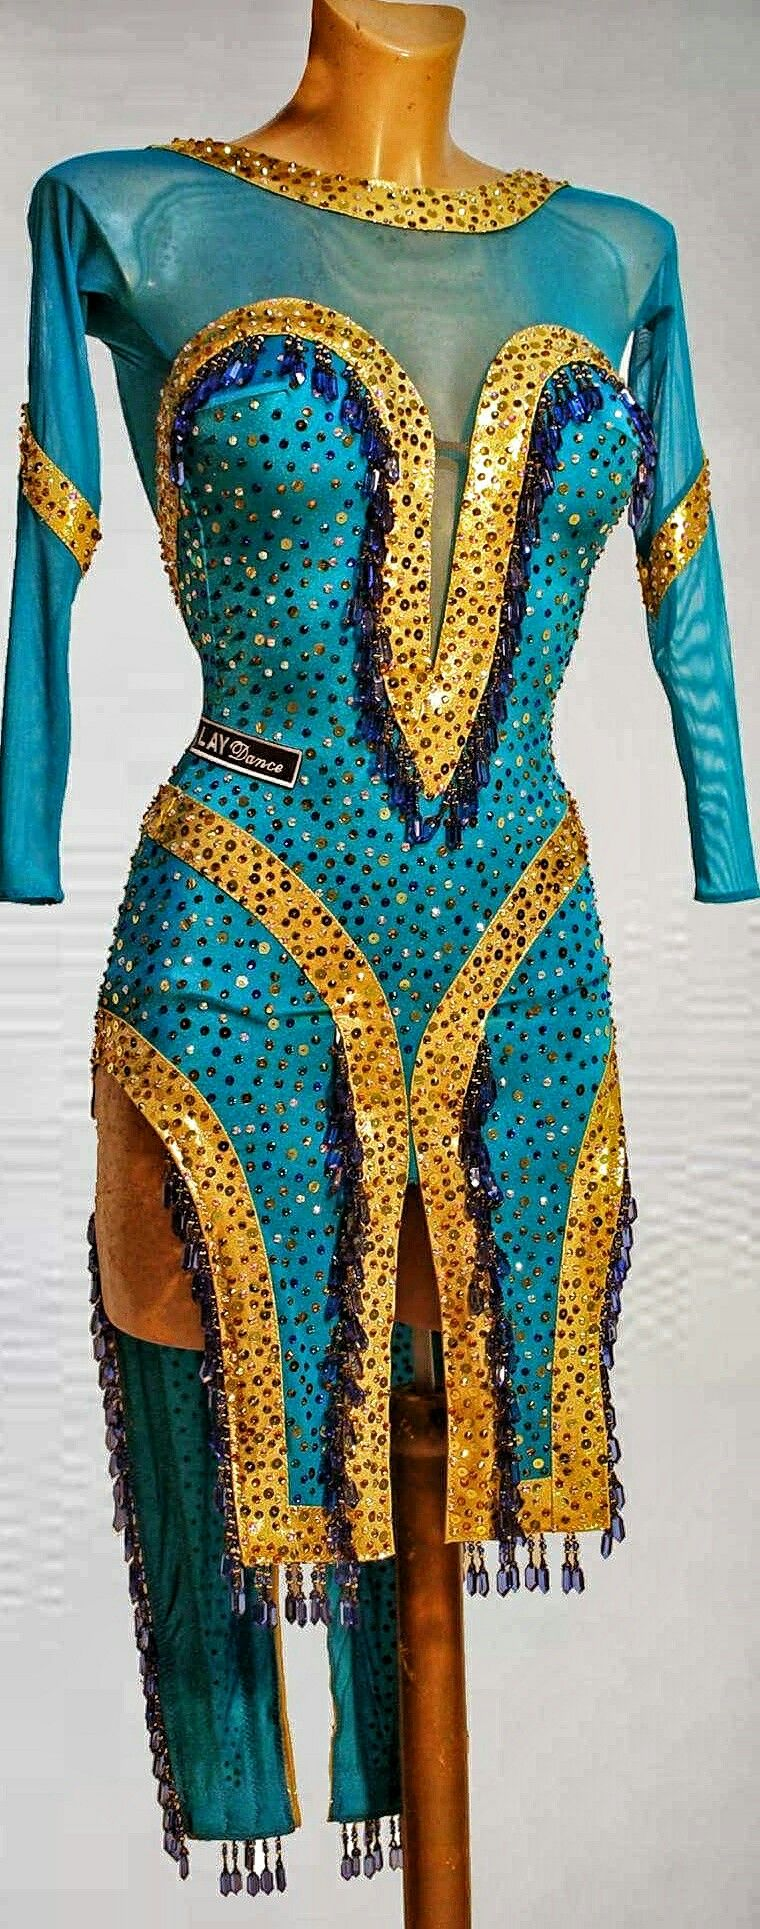 Costume.         LayDance